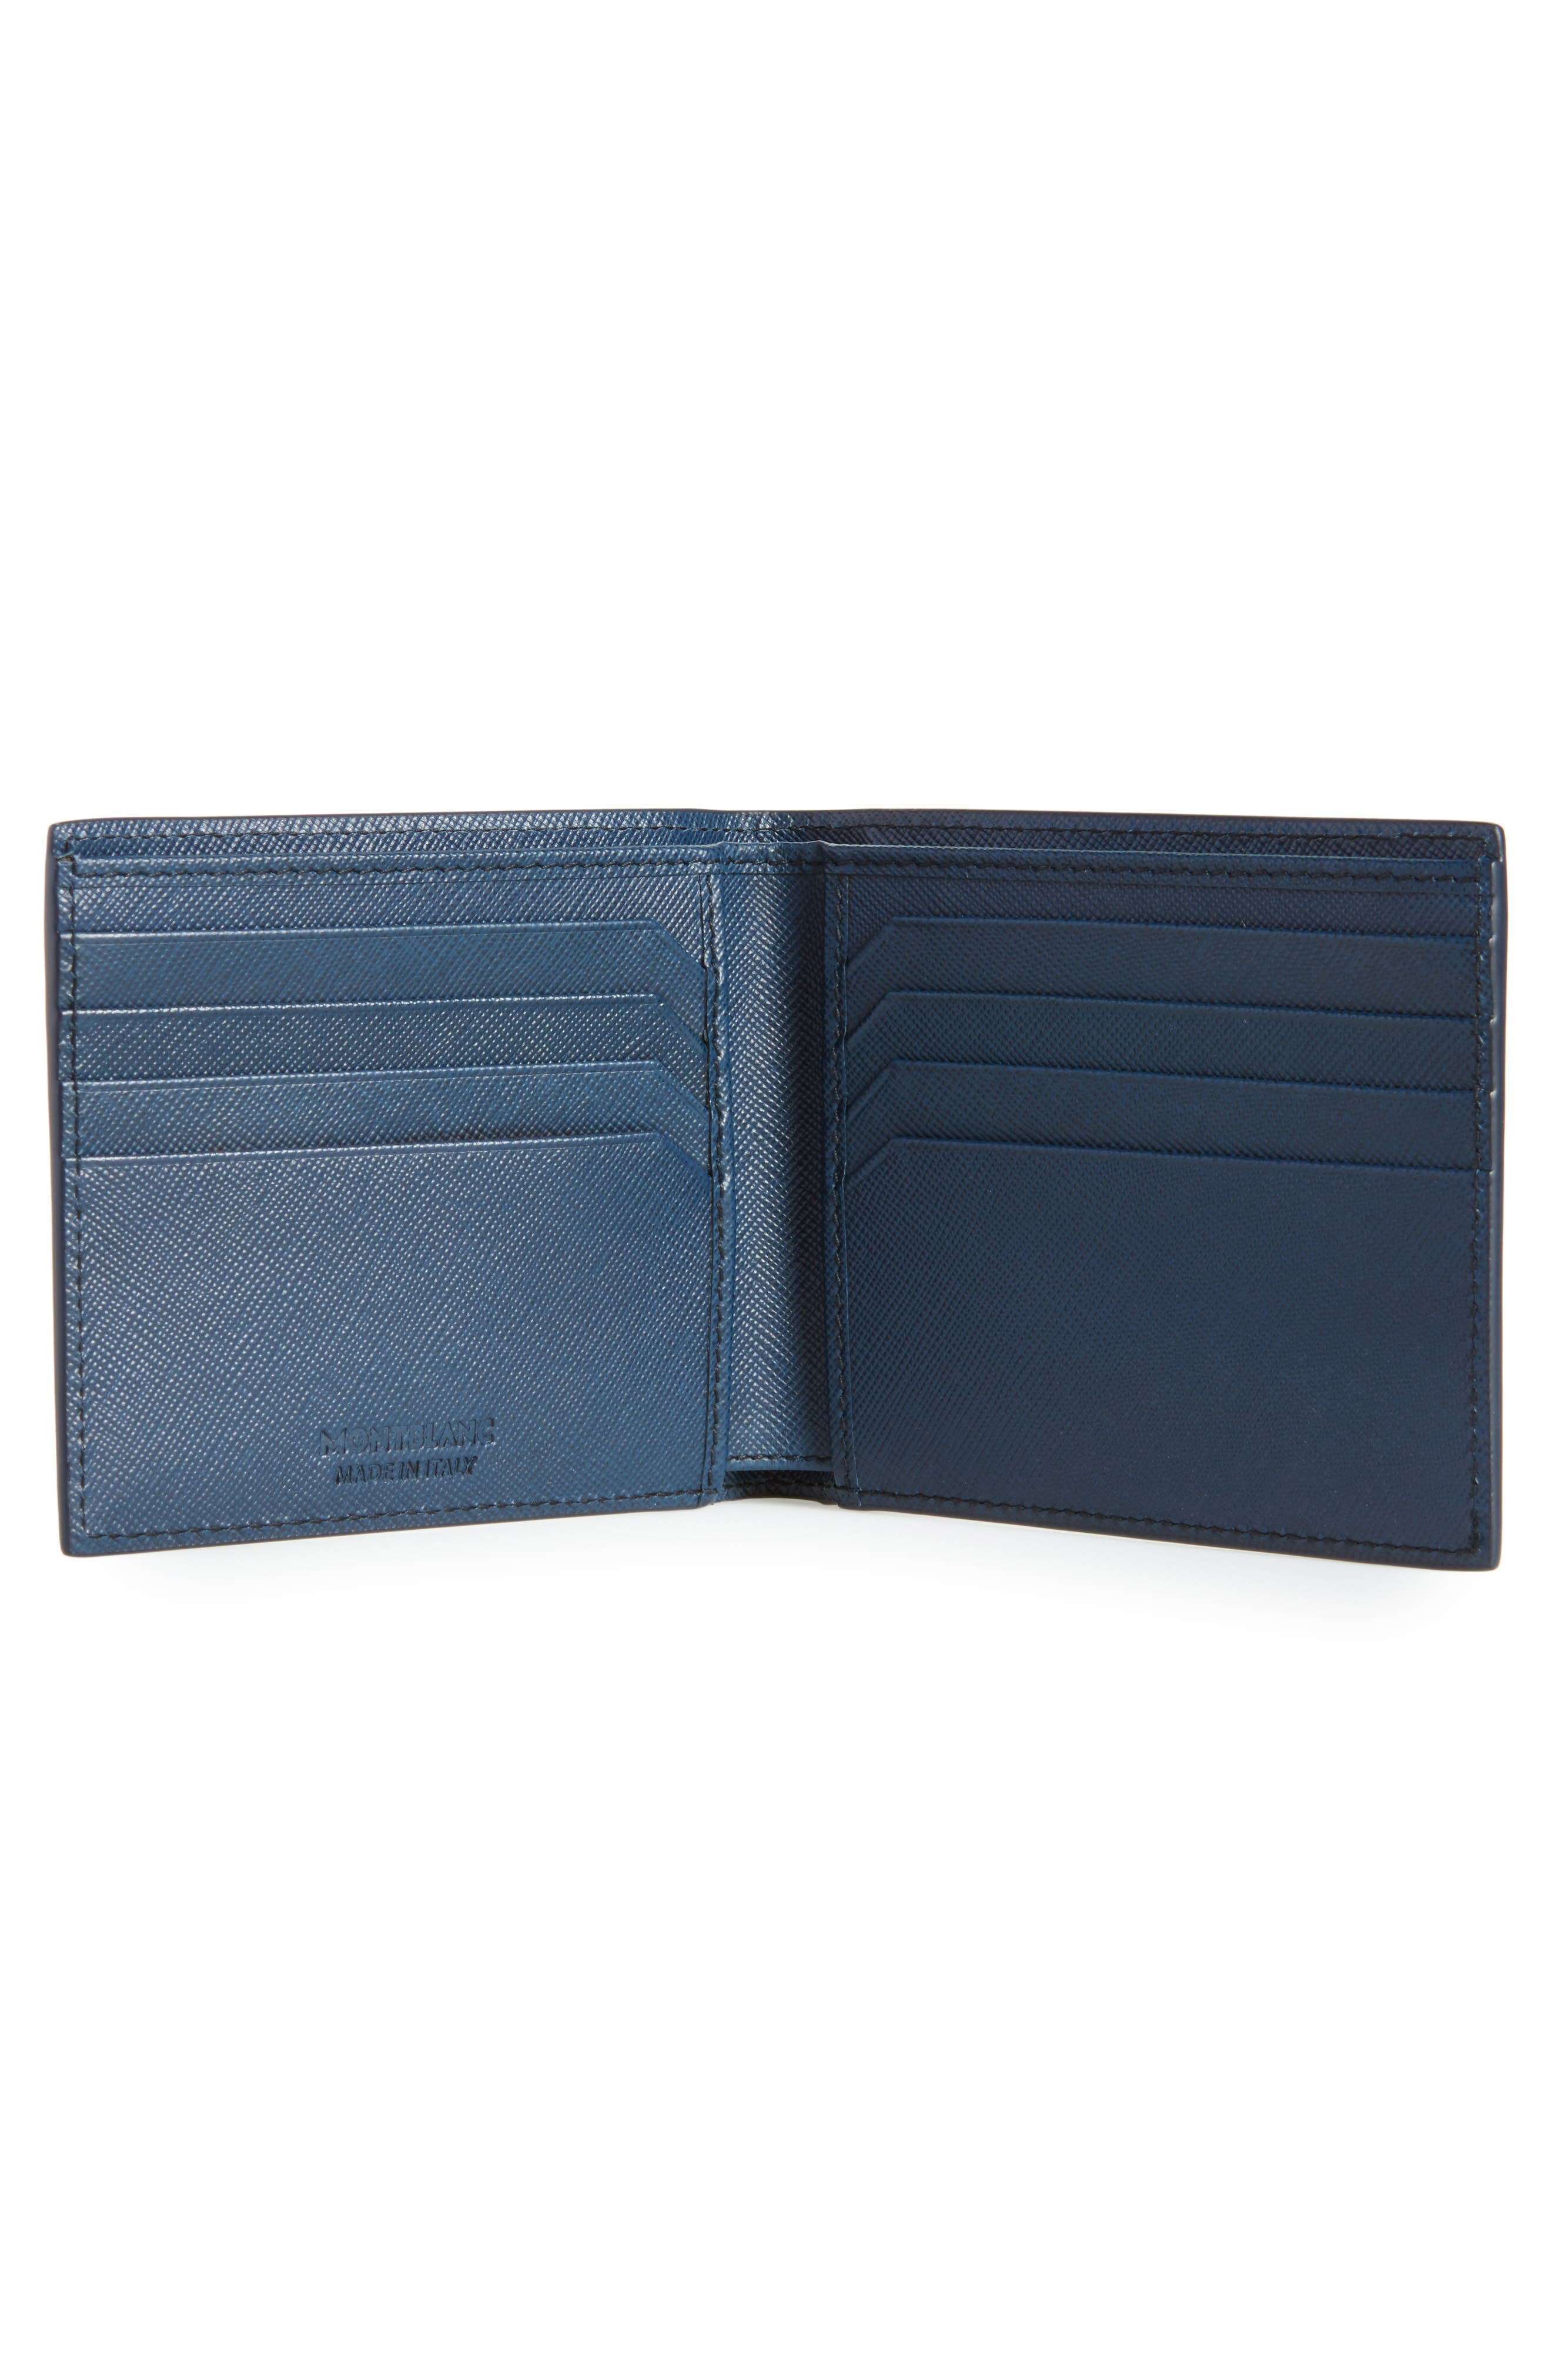 MONTBLANC, Sartorial Leather Wallet, Alternate thumbnail 2, color, INDIGO